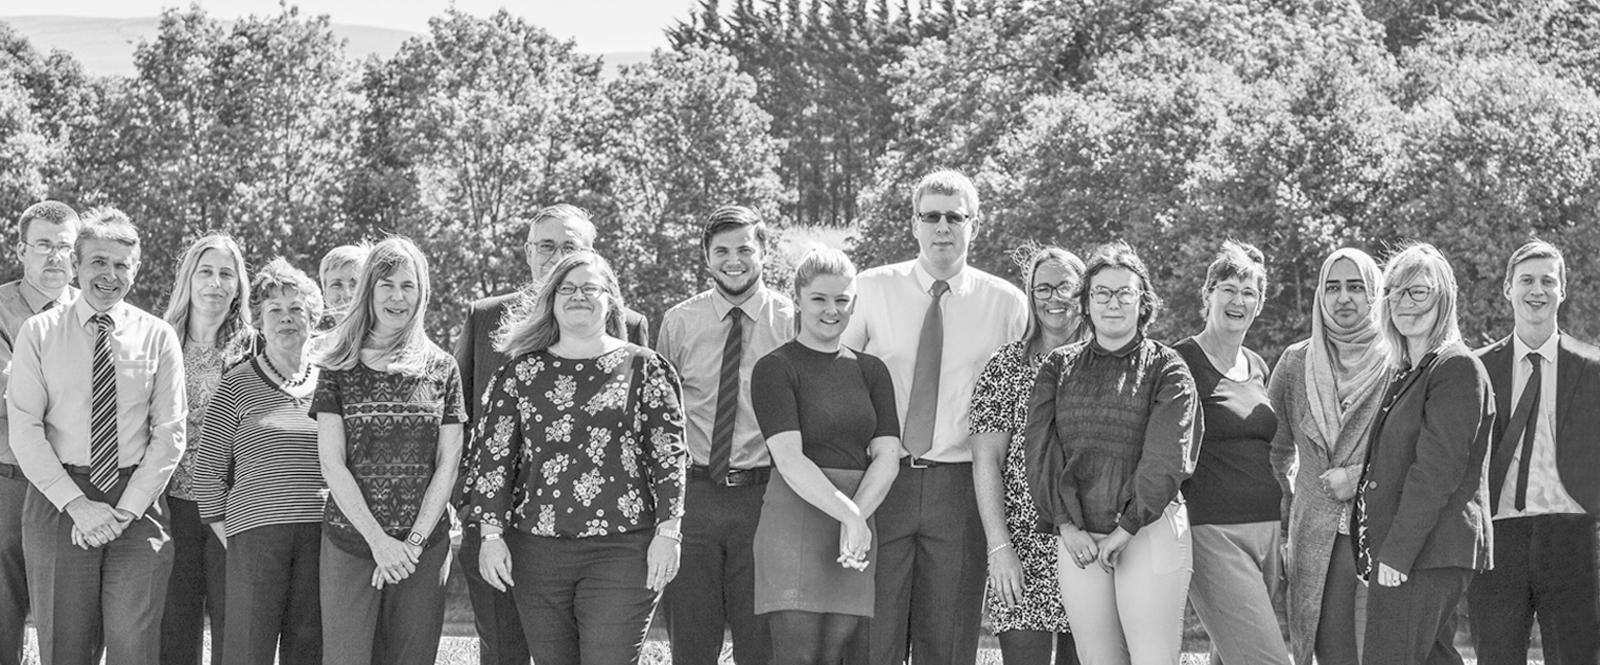 BKS_Accountants_Clitheroe_Bentham_Team_Photo